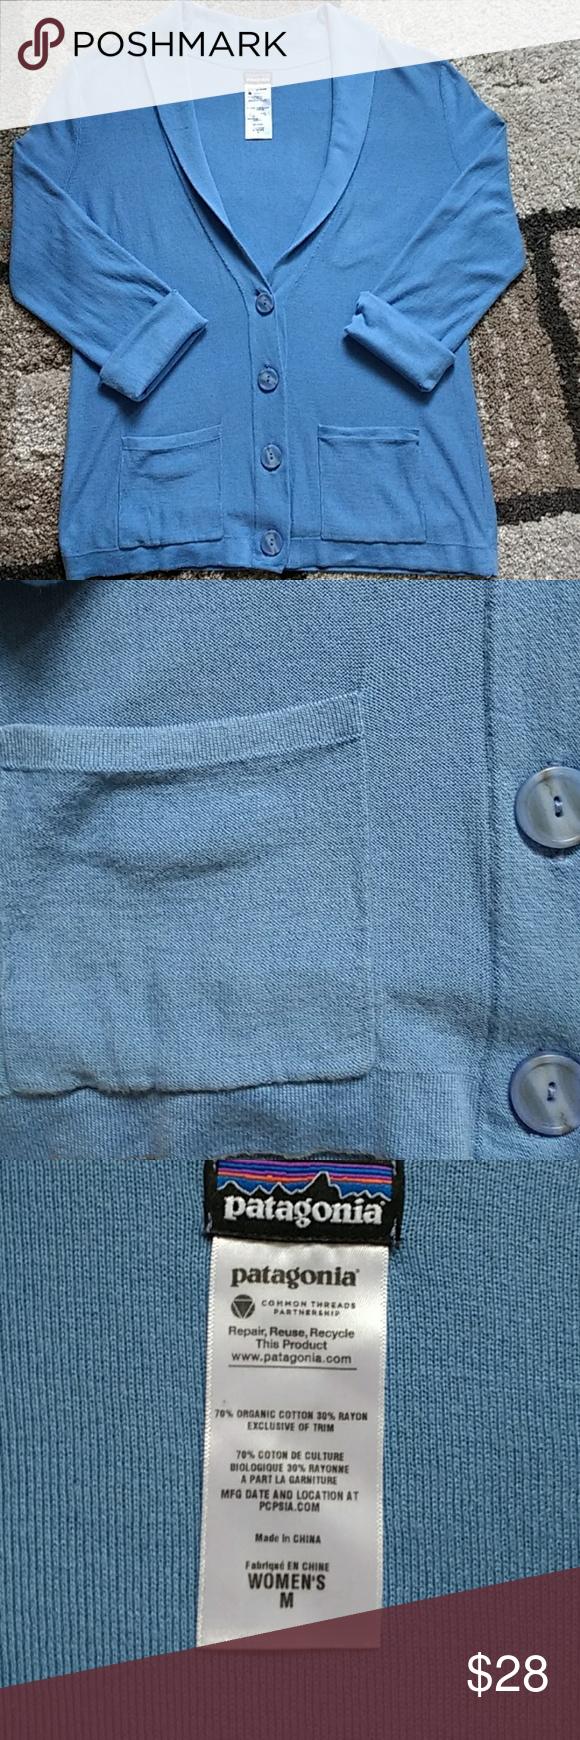 "Patagonia cardigan size medium Adorable corn flour blue pocket cardigan size medium with a 19"" bust and 24"" length Patagonia Sweaters Cardigans"